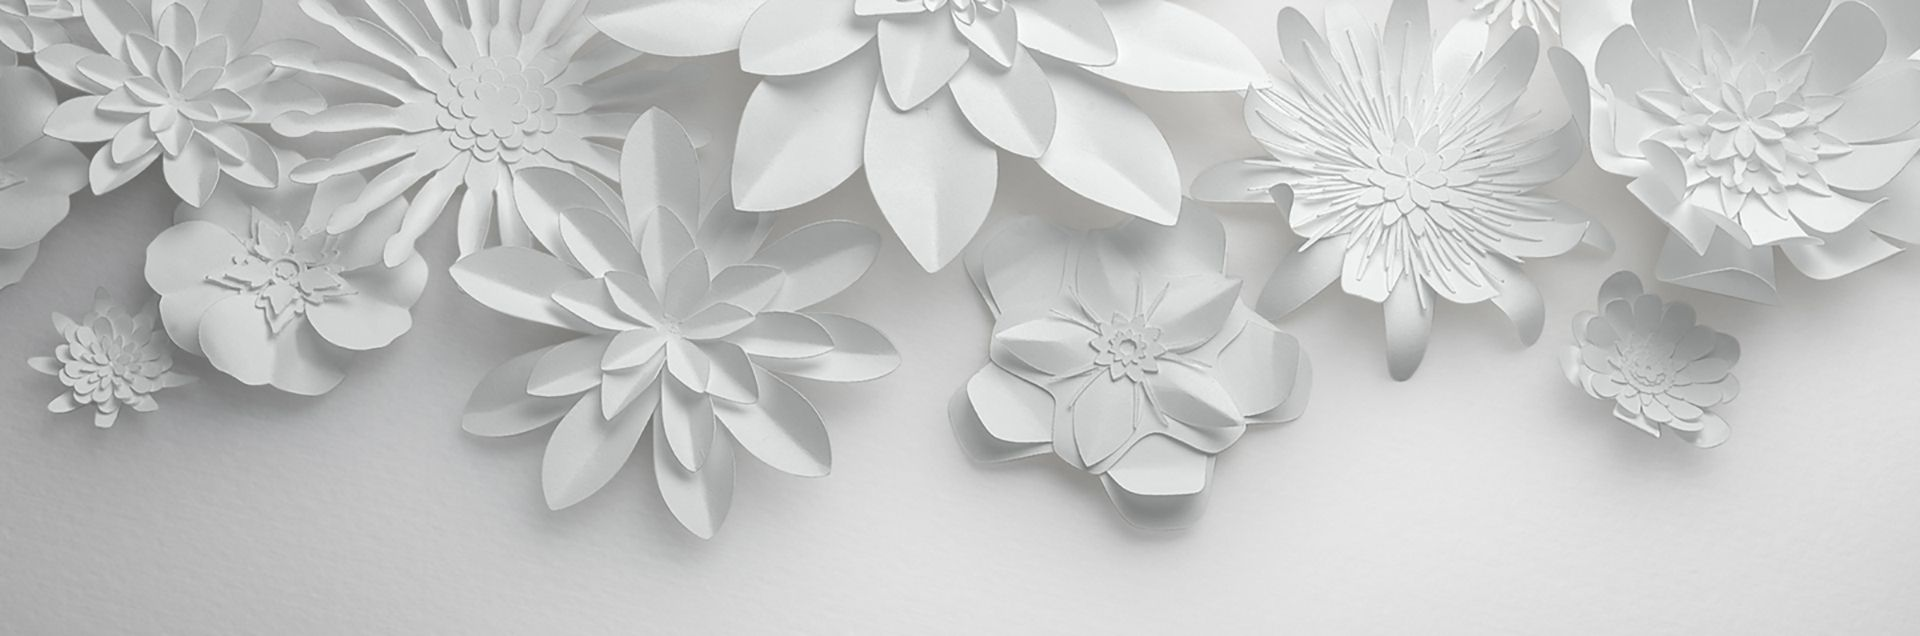 Bialy Papier Kwiaty Ciete W Tle White Paper Flowers Flower Backgrounds Paper Flowers